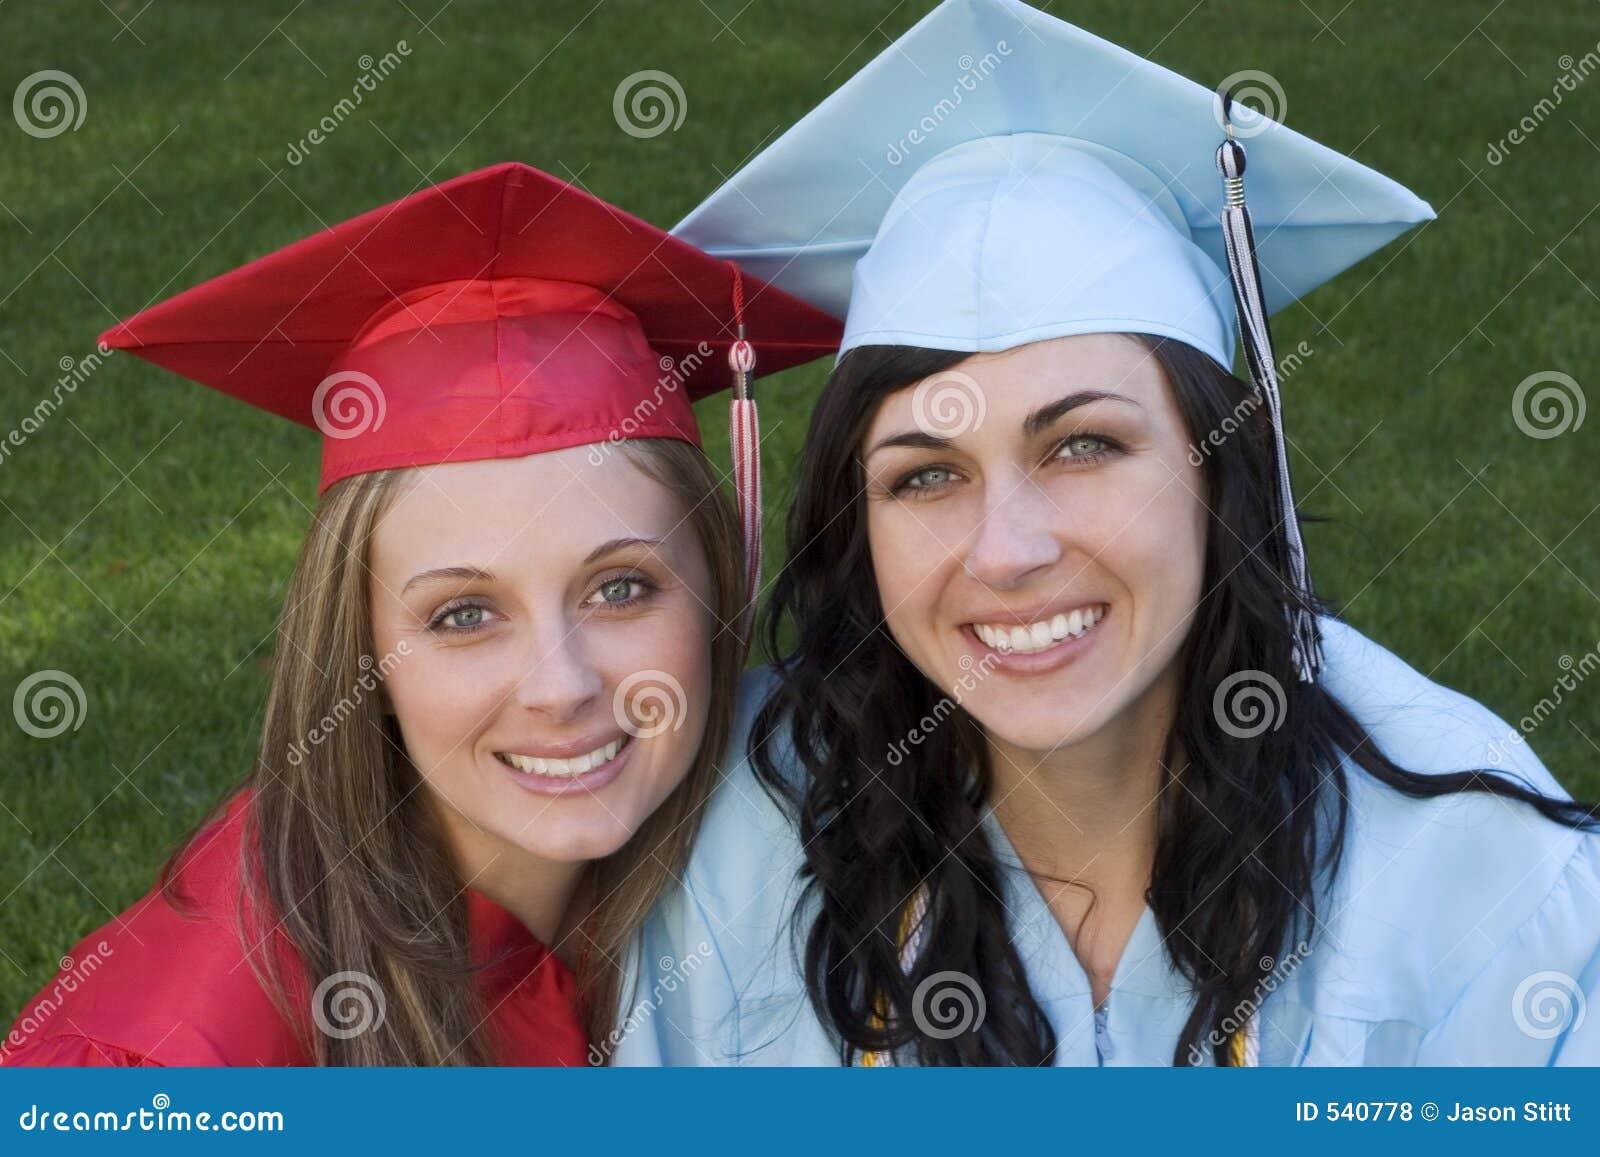 Download 毕业生 库存照片. 图片 包括有 妇女, 朋友, 毕业, 微笑, 学院, 褂子, 兴奋, 教育, 毕业生, 友谊 - 540778